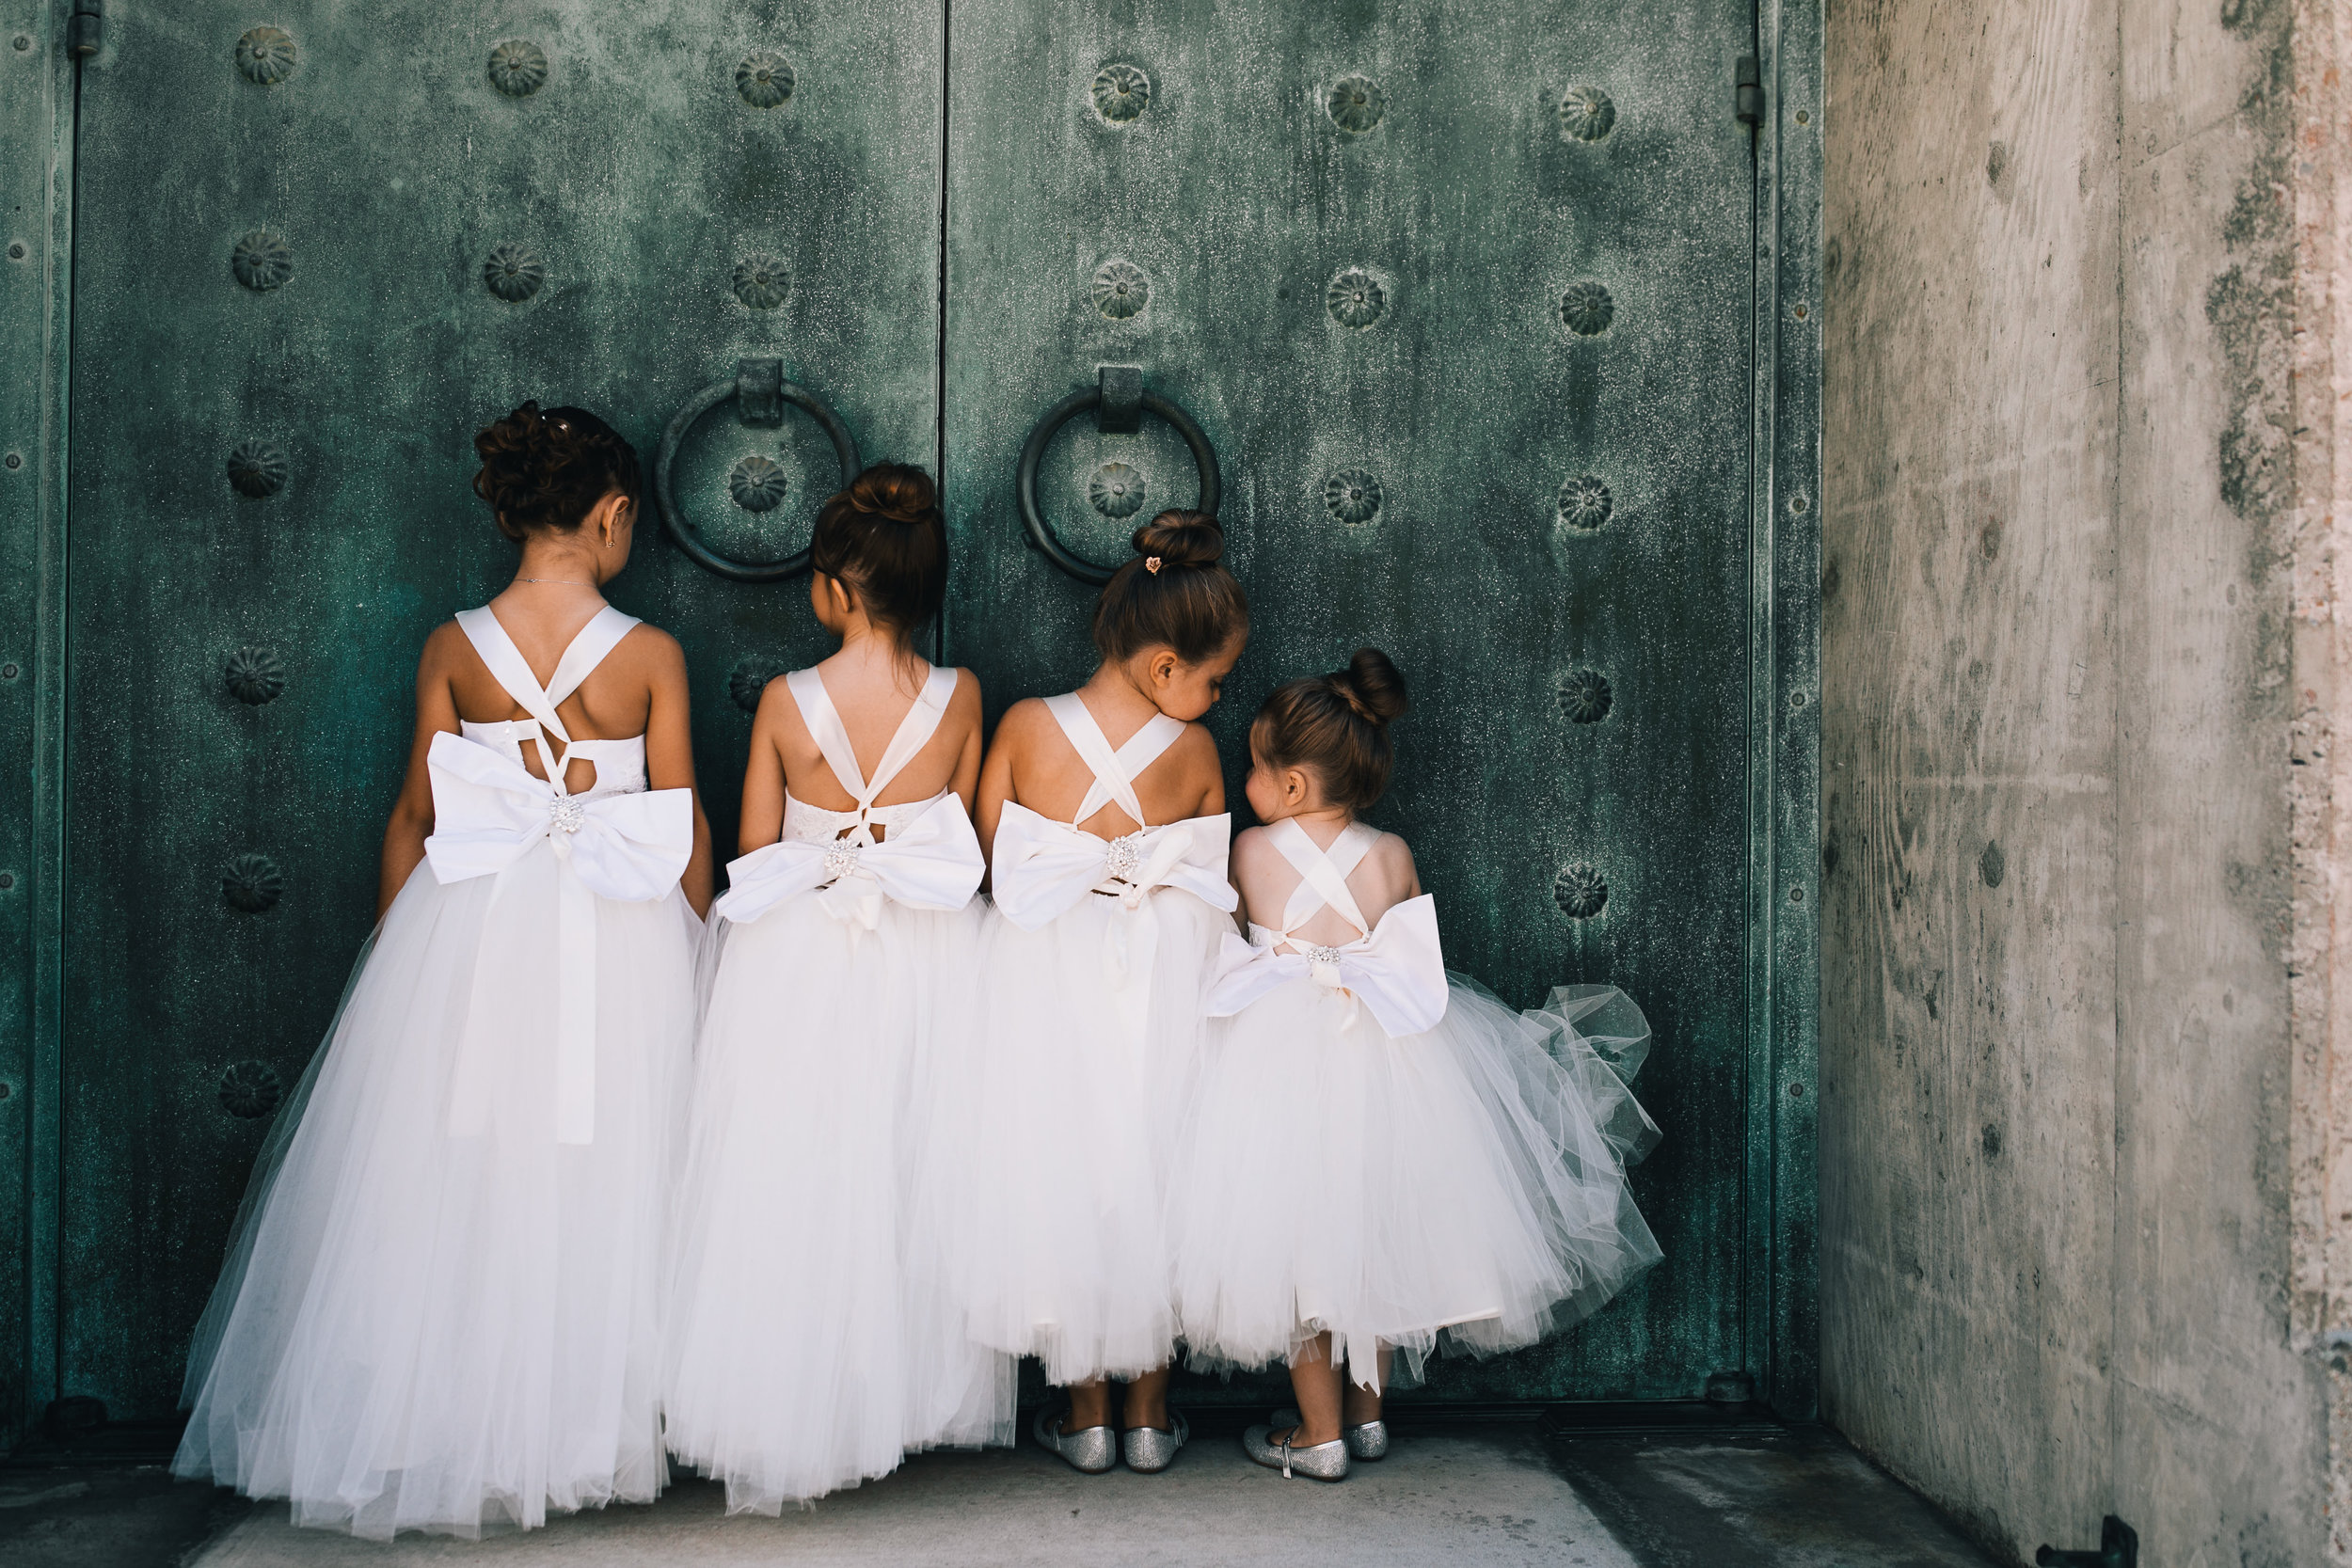 2018.09.08 Litsa and Sofo Greek Wedding Sneak Peak-21.jpg